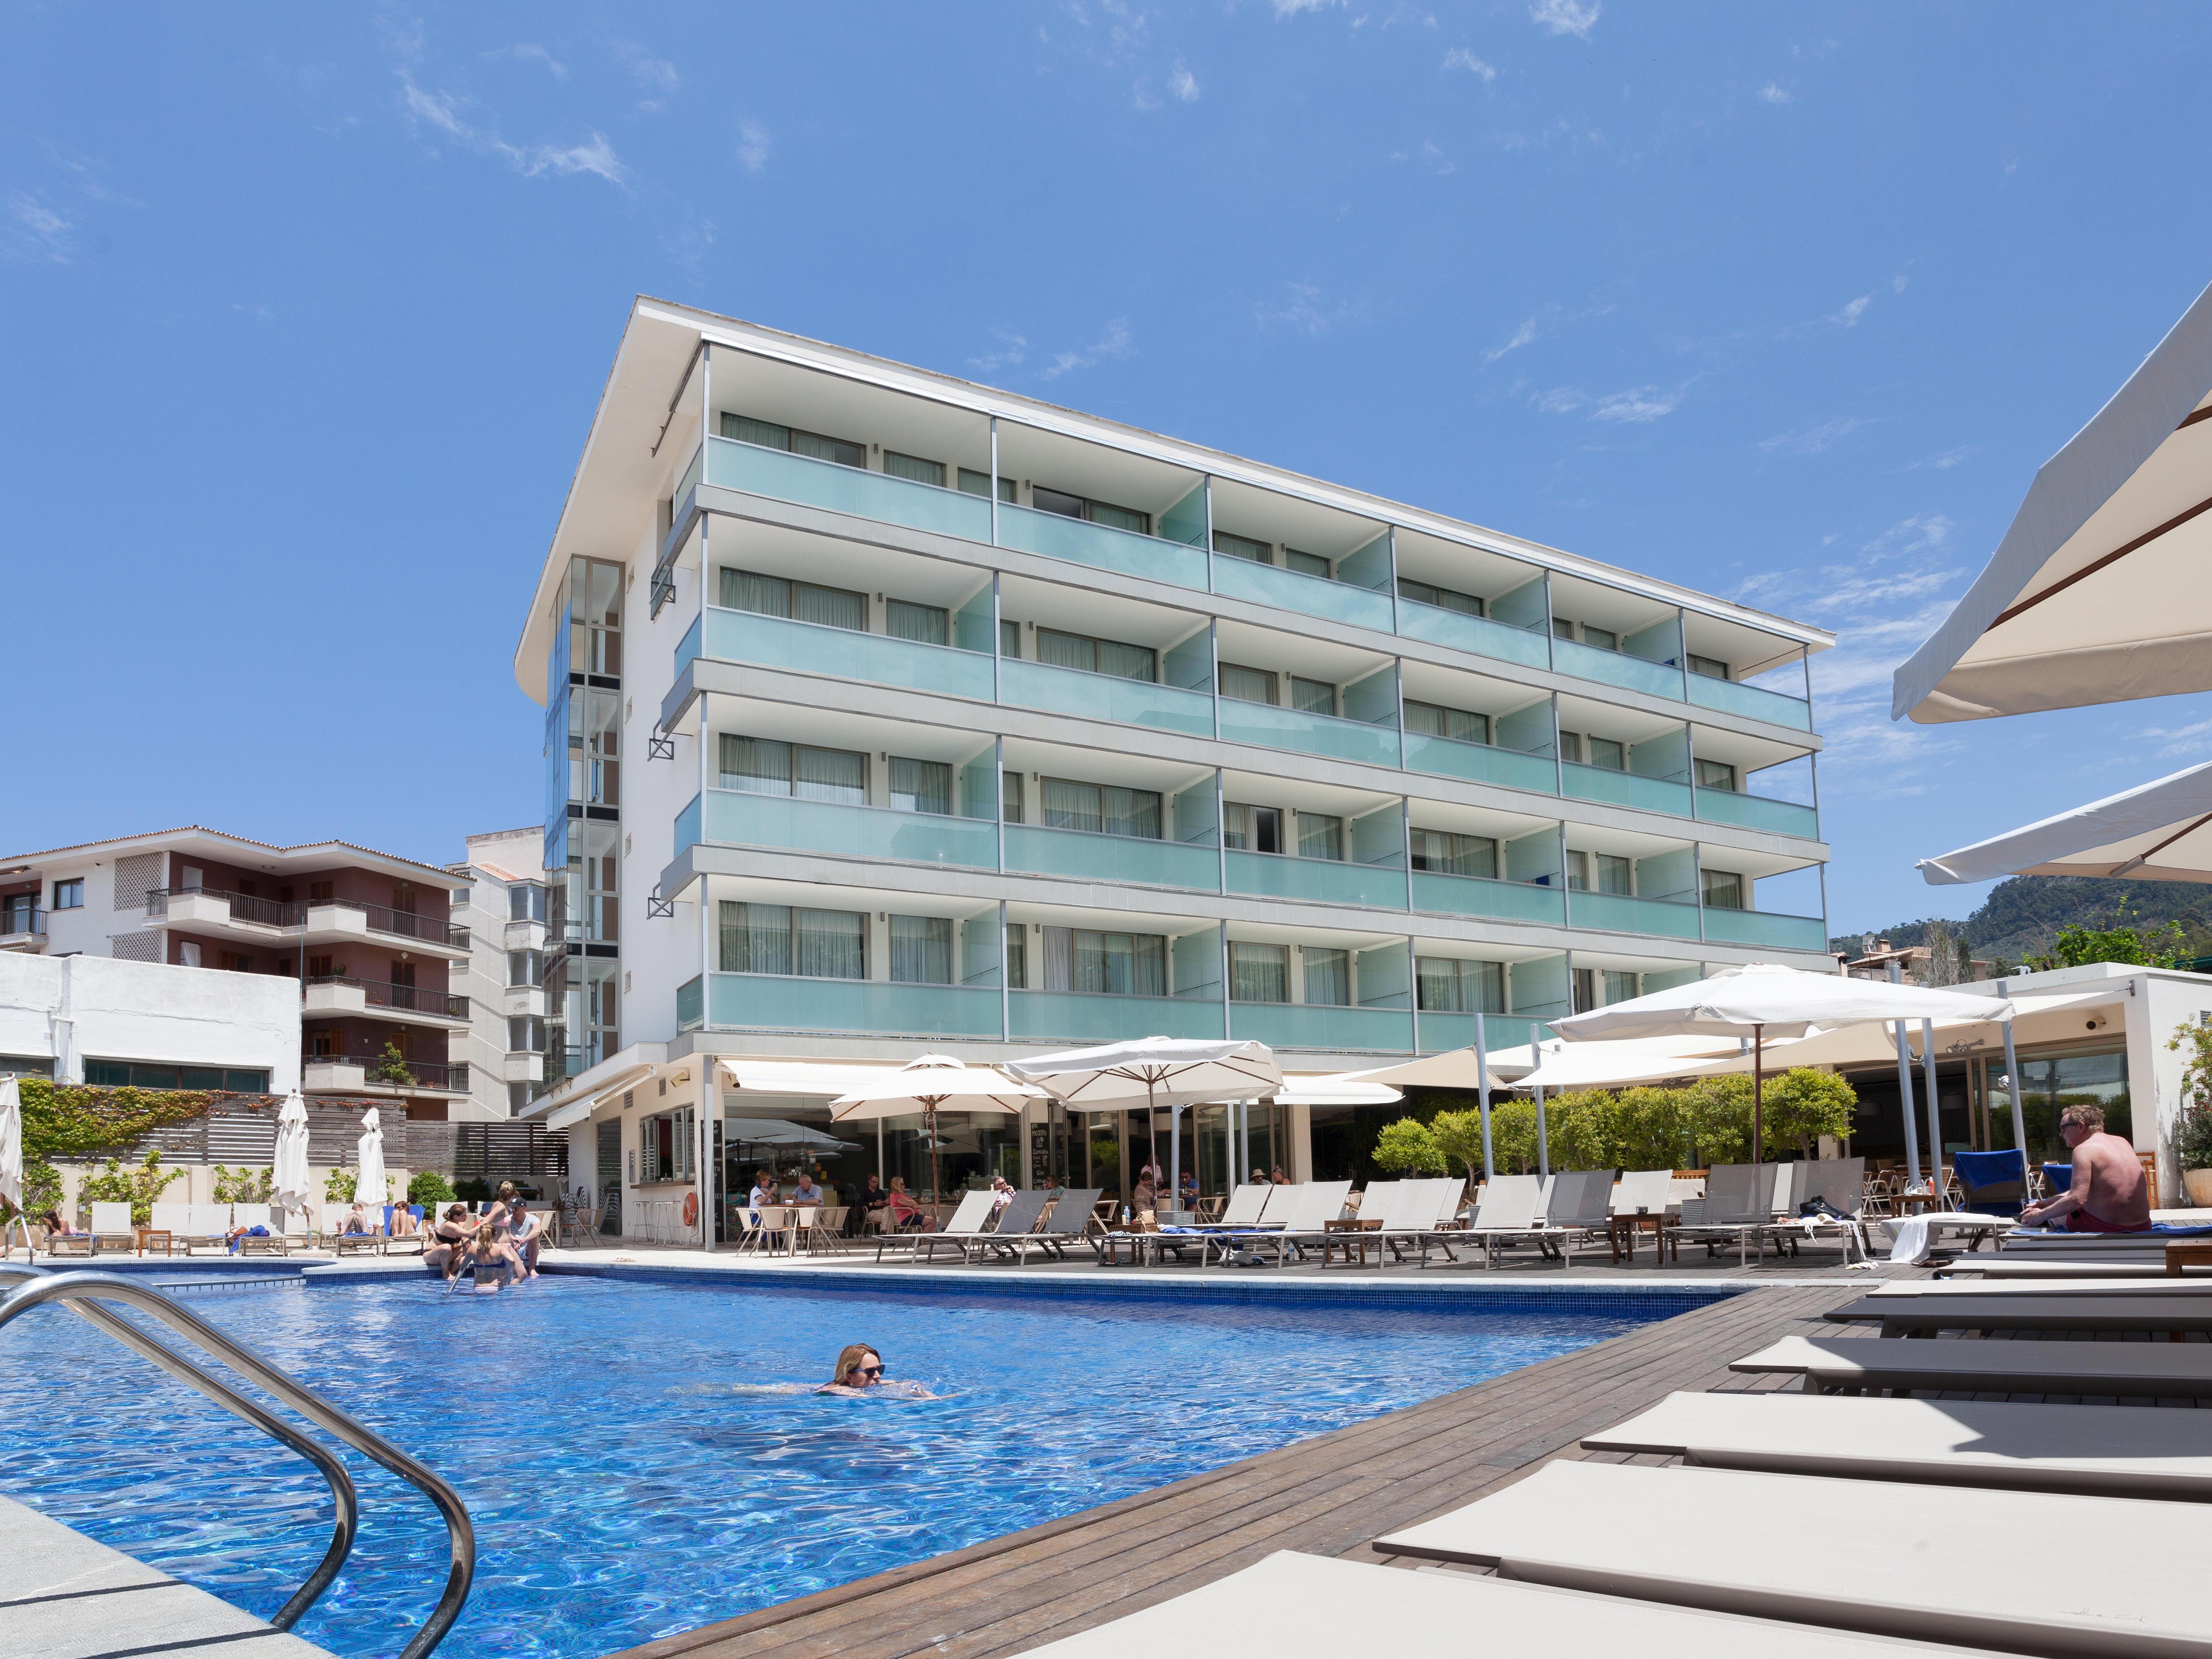 Aimia Hotel in Port de Sóller, Majorca